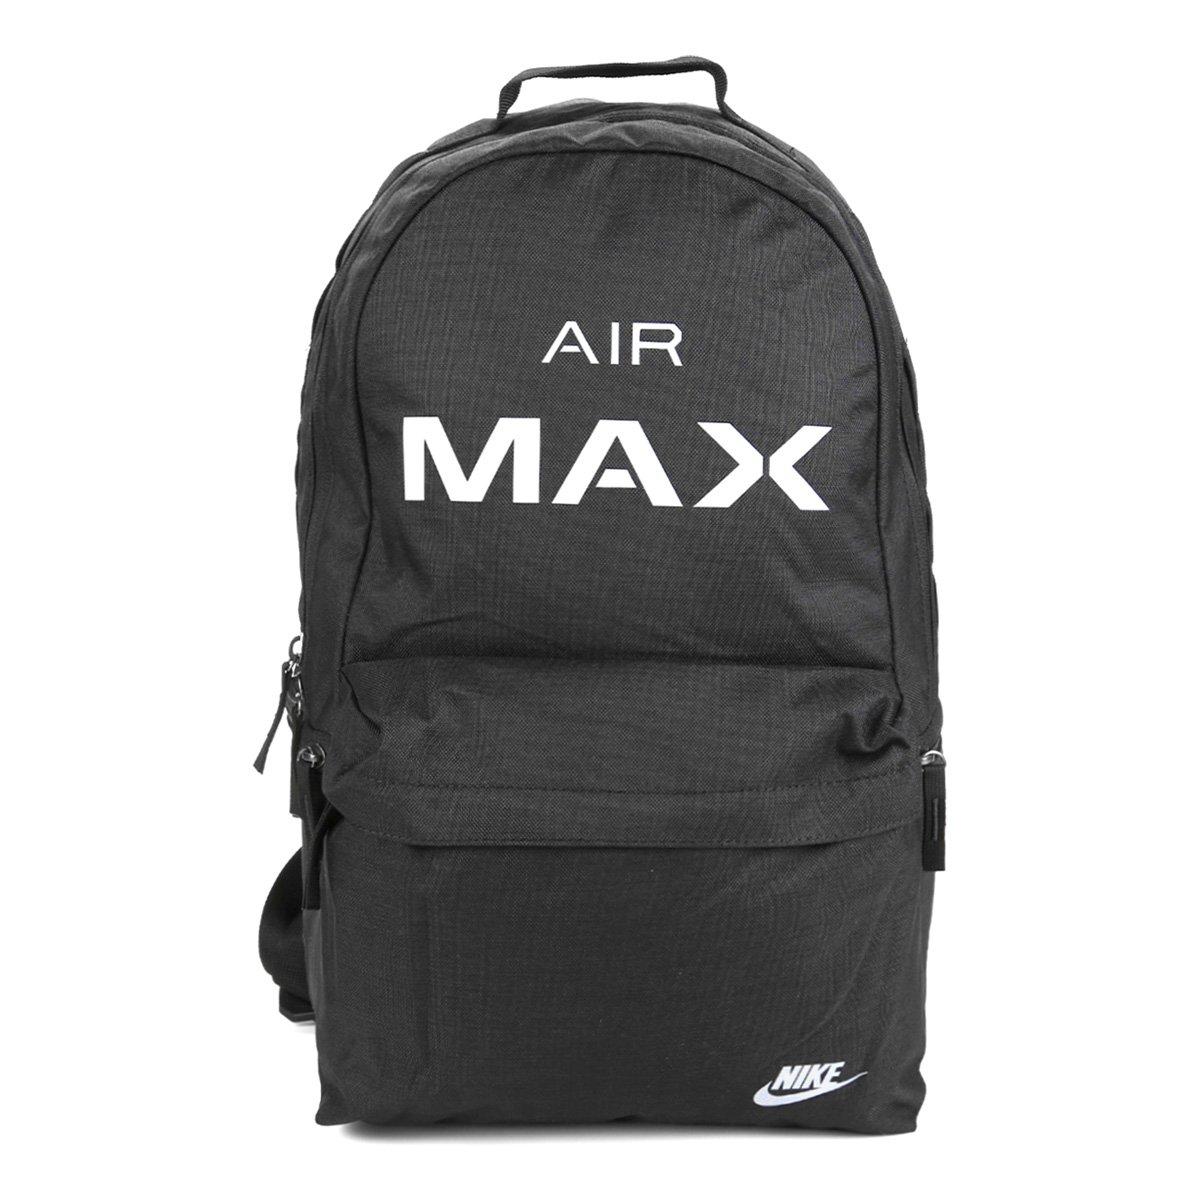 fd0b378520be4 Mochila Nike Air Max Estampada Masculina - Preto e Cinza - Compre Agora